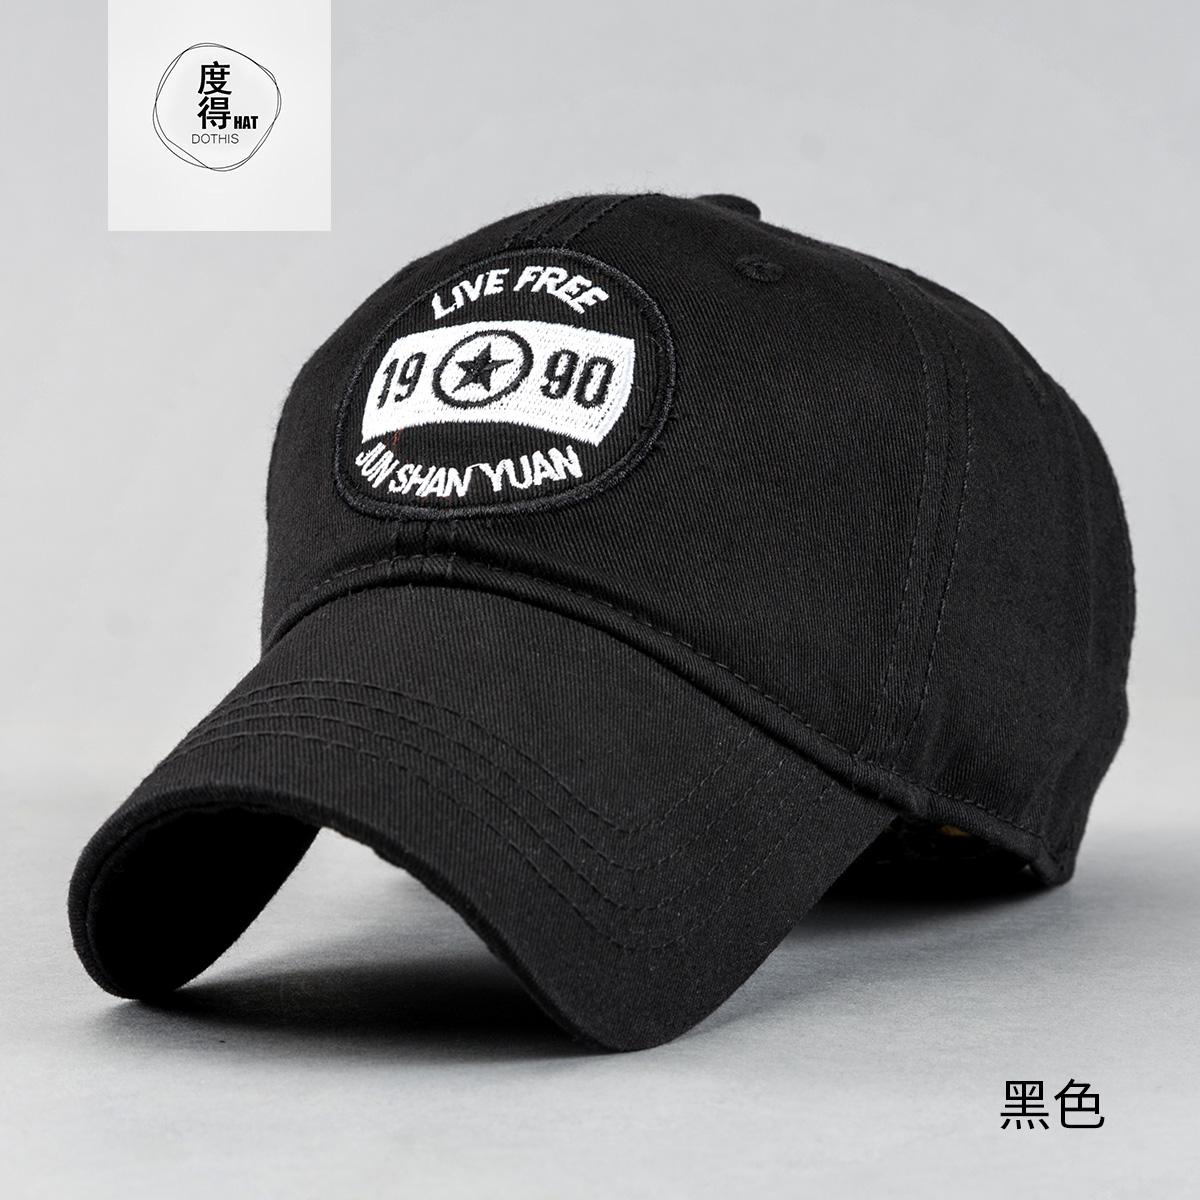 c287b83fe0111 Topi Baseball Korea Fashion Style Pria Topi Model Biasa All-match Modis  Bordir